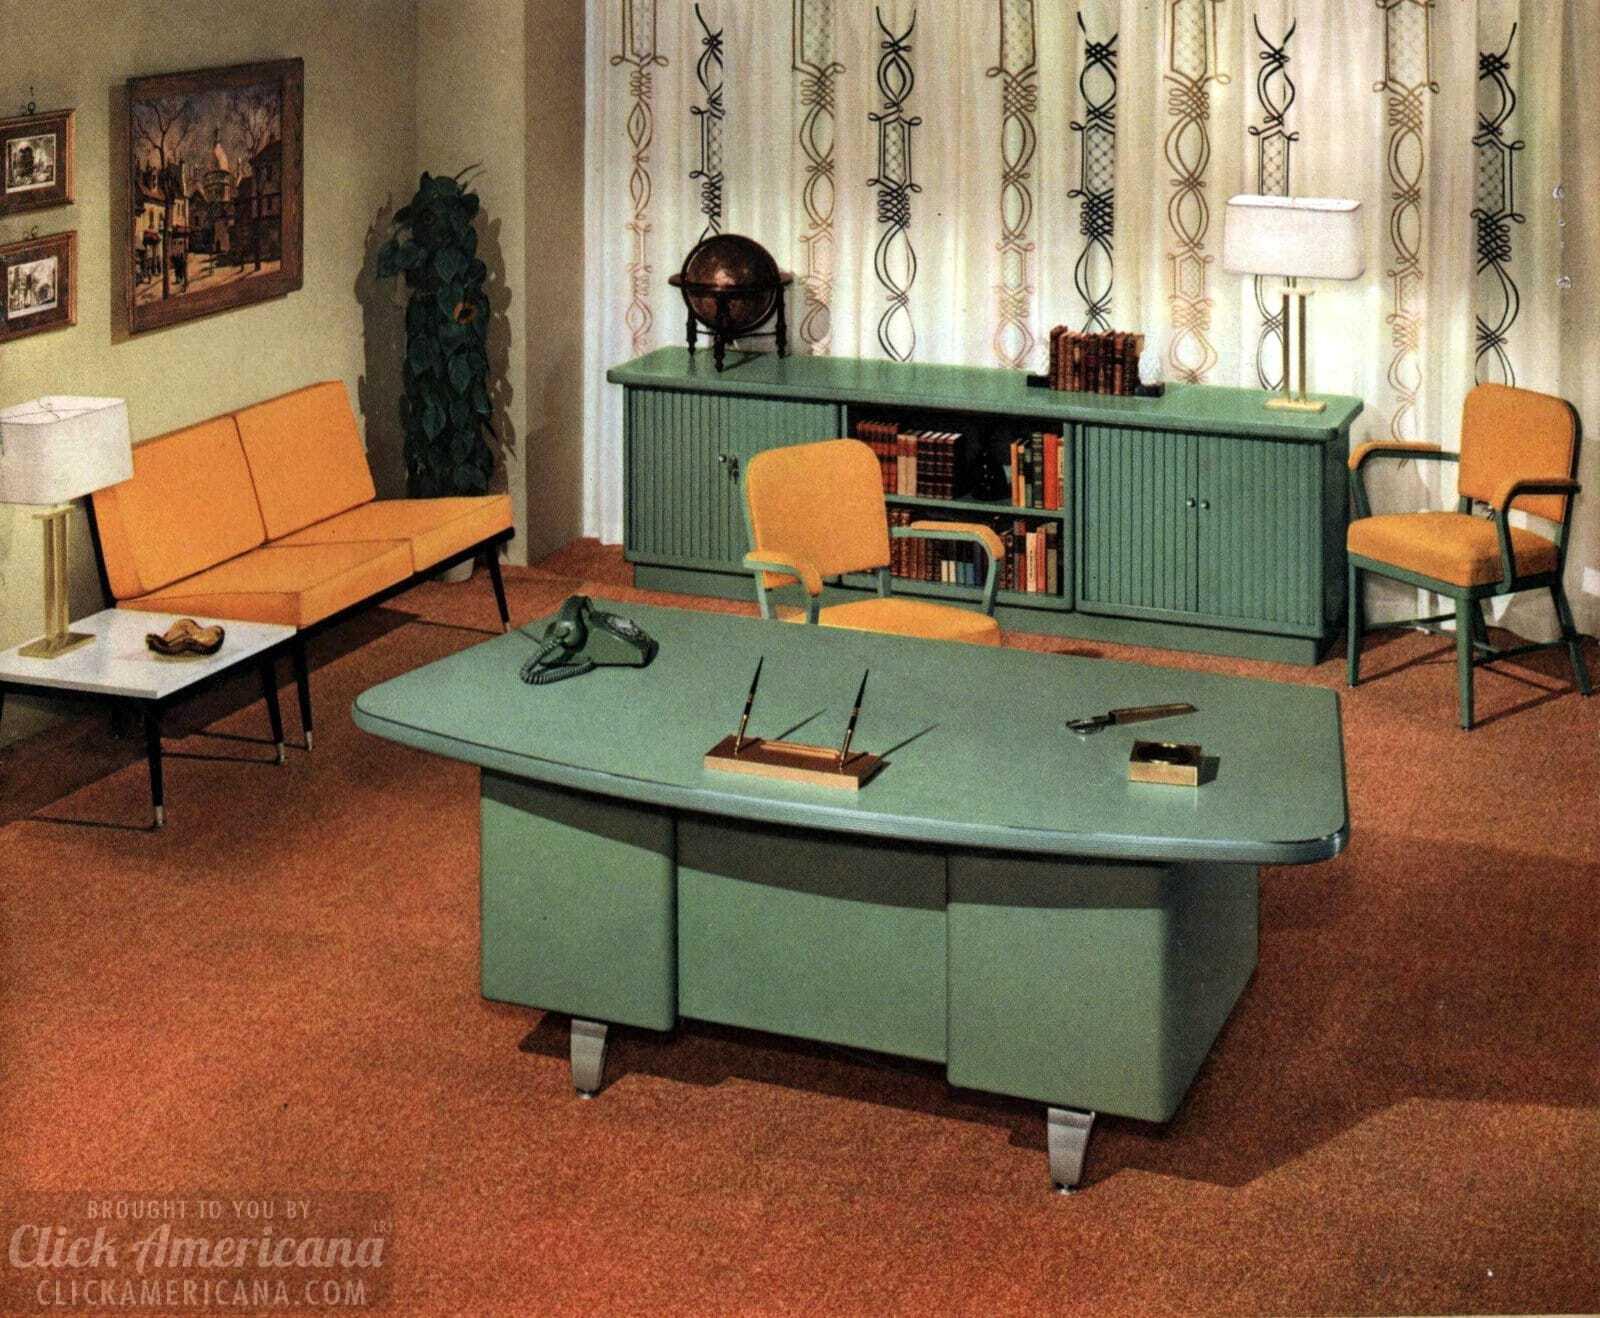 Mid Century Modern Retro Office Desks From 1959   Click Americana (2)